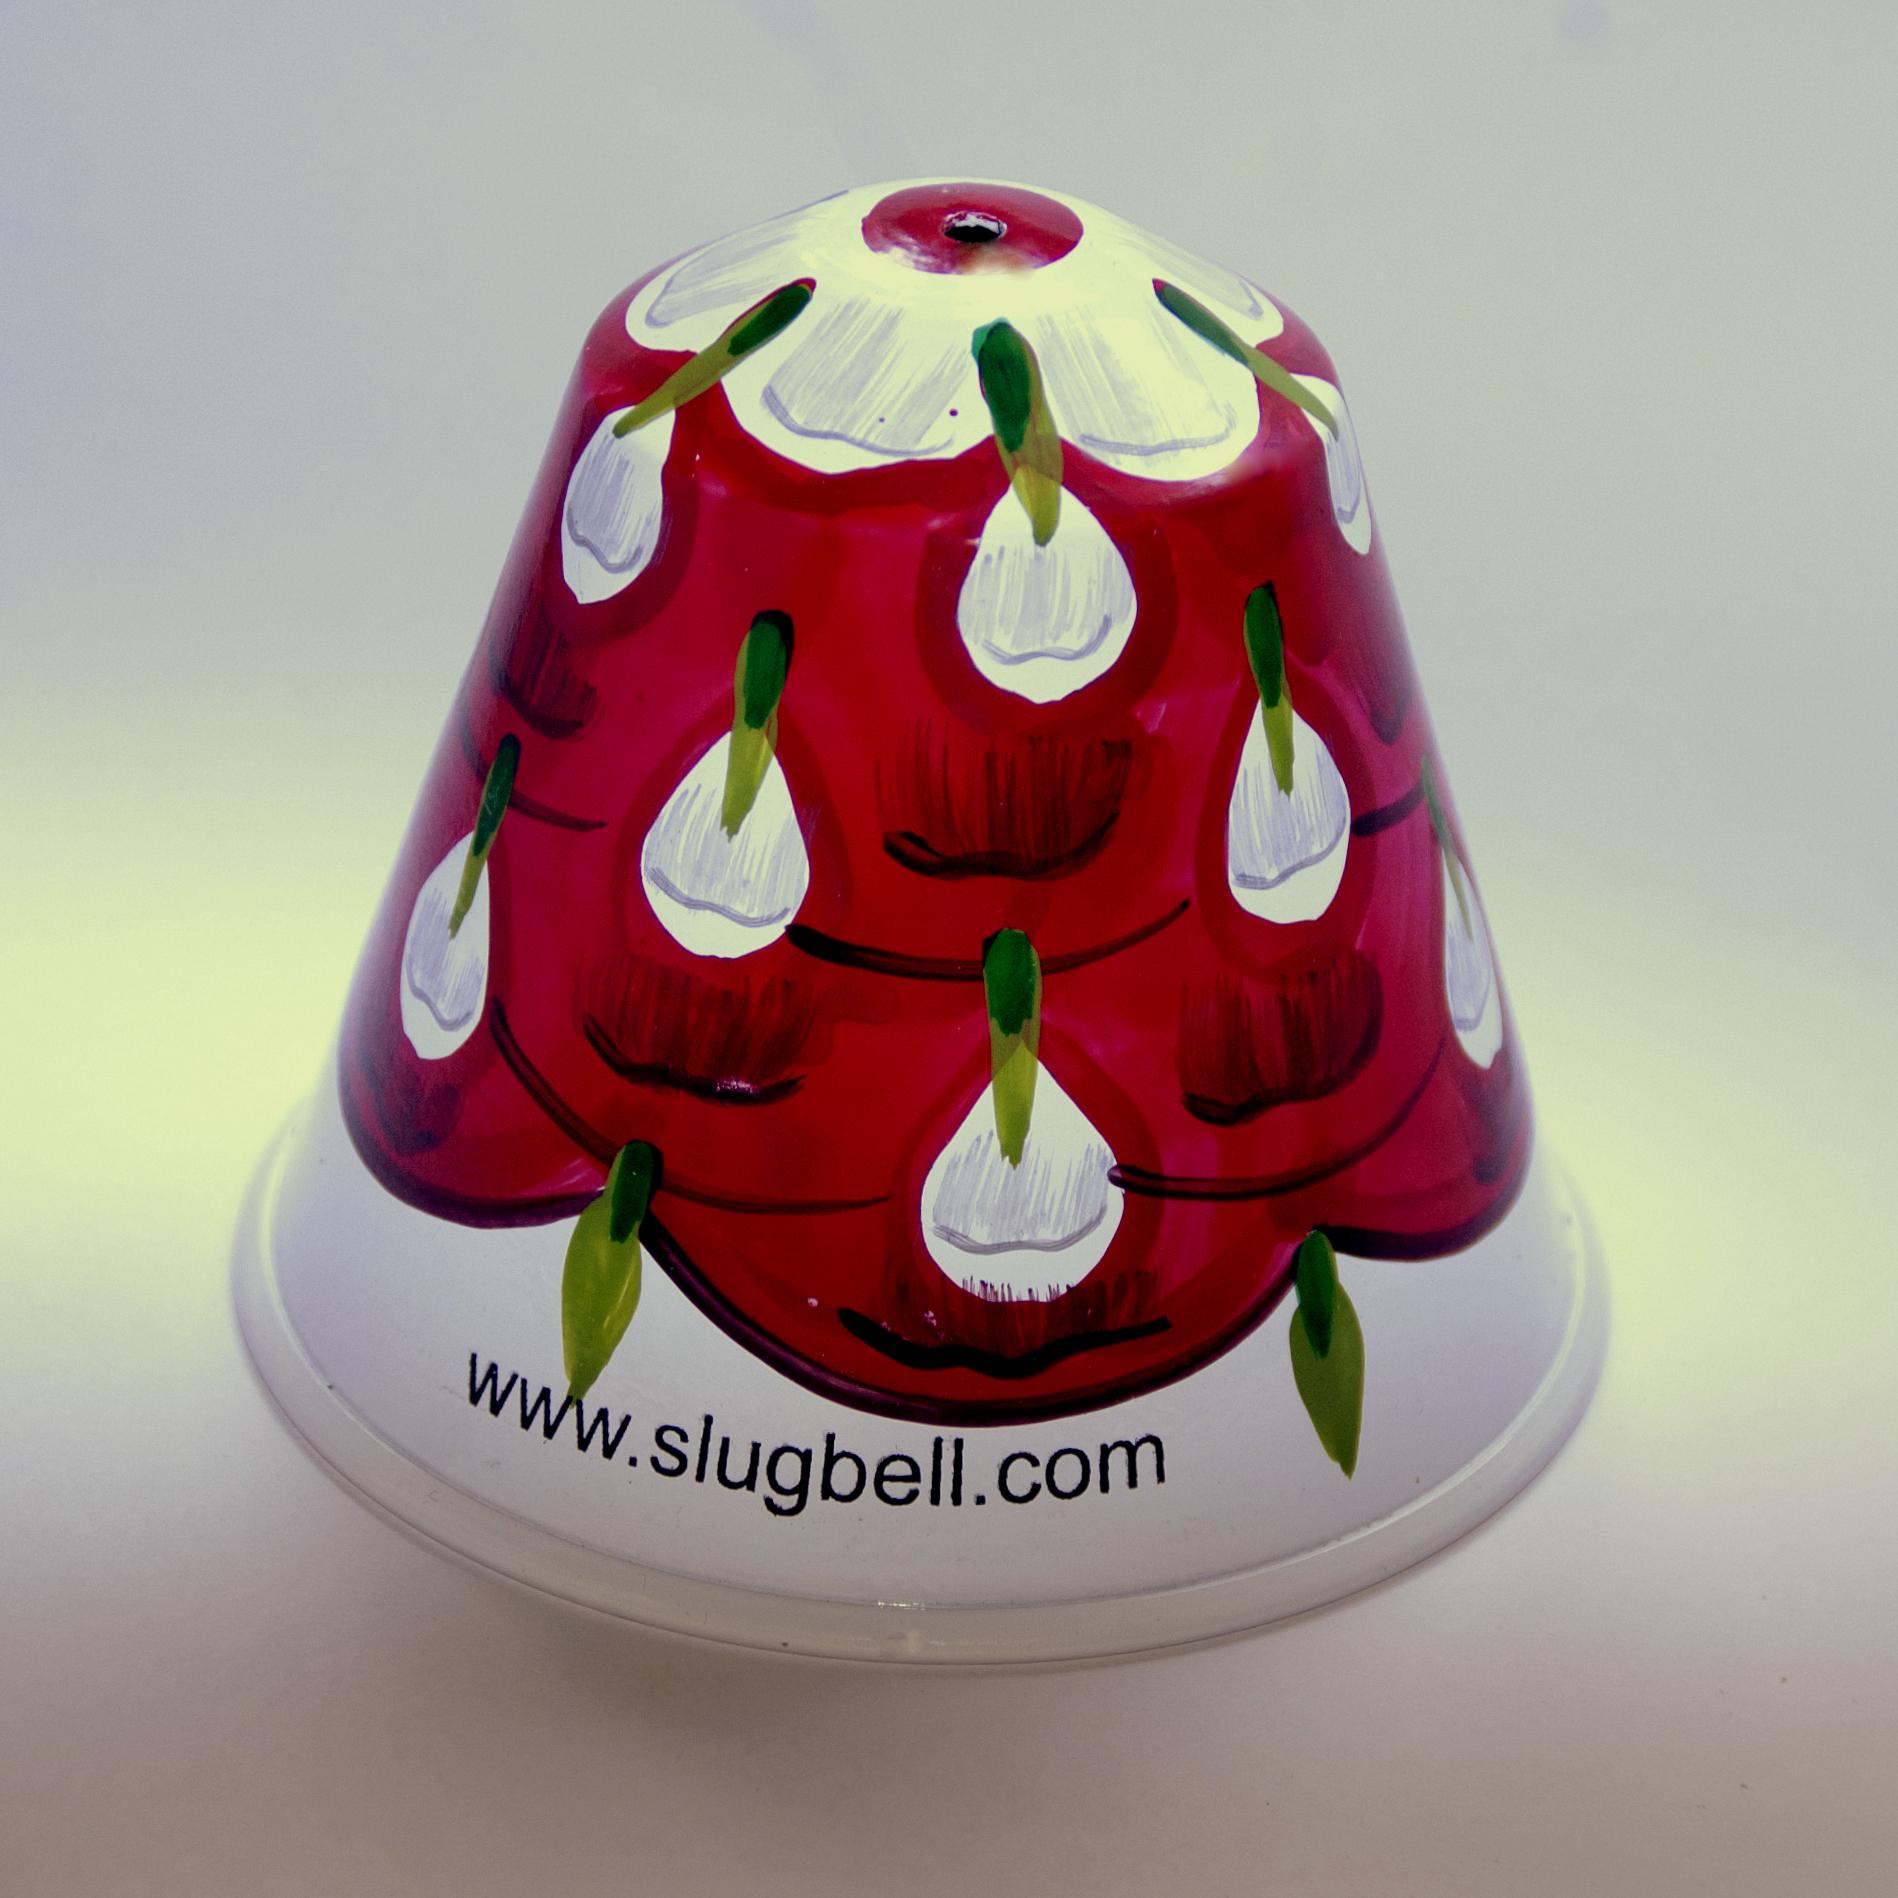 Tudor rose slug bell